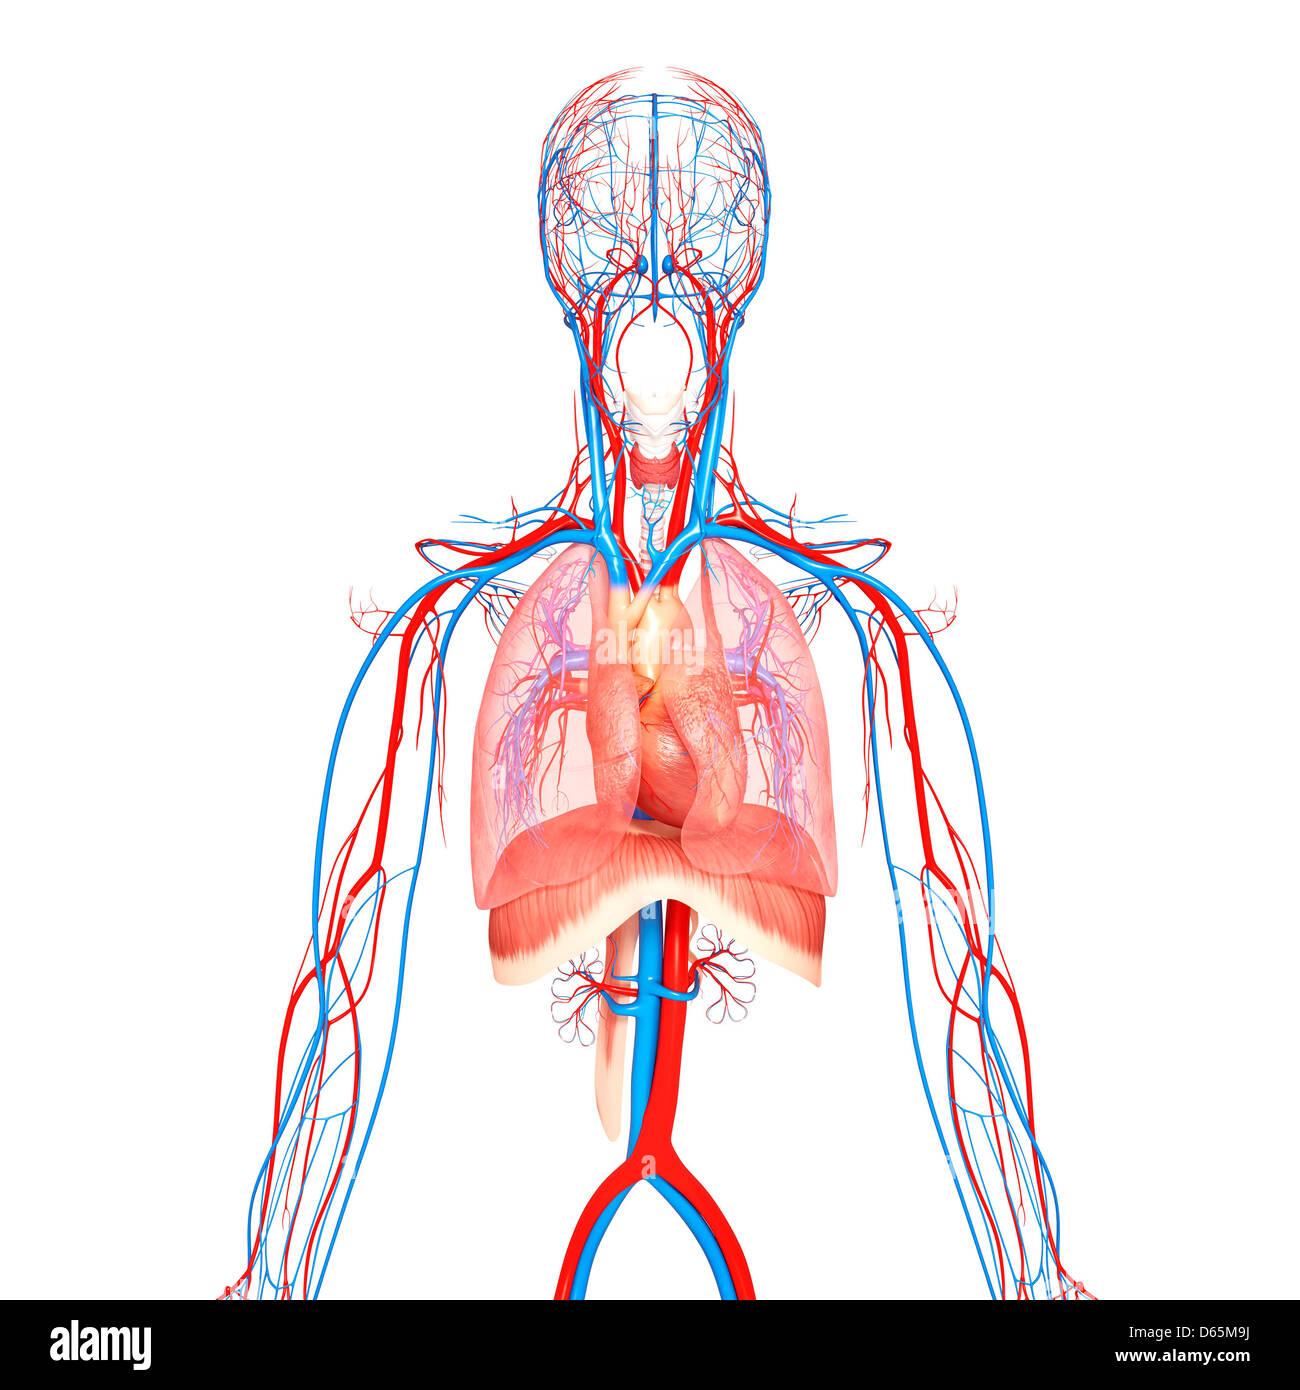 Human Thorax Anatomy Stock Photos Human Thorax Anatomy Stock